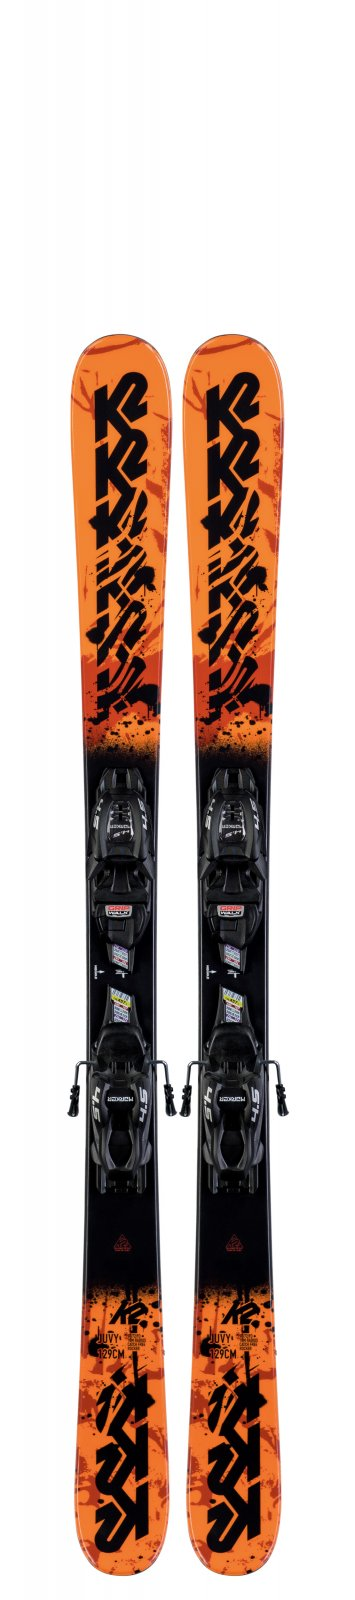 2020 K2 Juvy W/ Marker FDT 4.5 Junior Ski